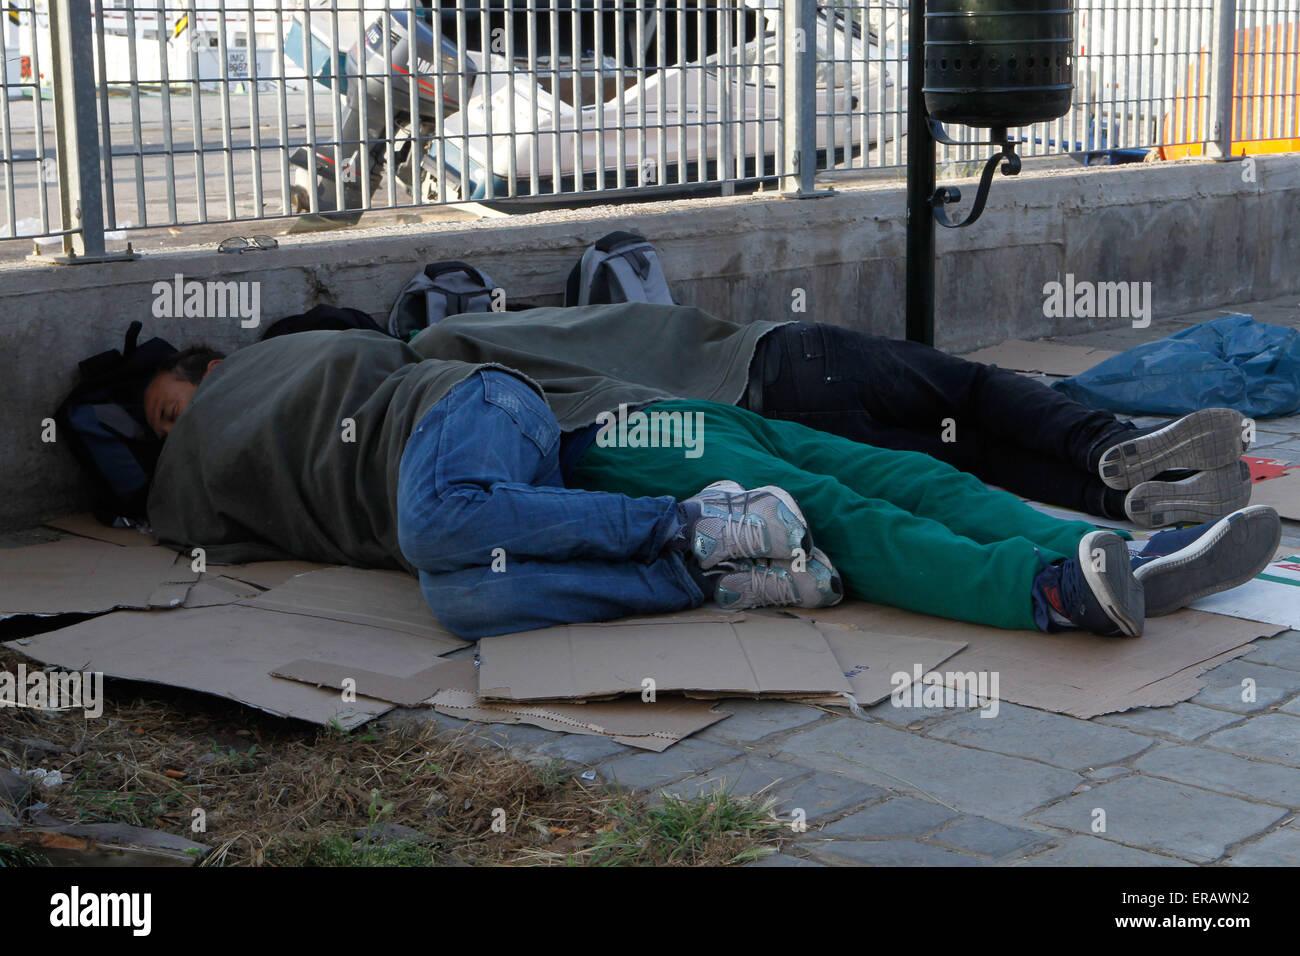 Hundrends migrantes llegó cada día en la isla de Lesbos del Egeo oriental de la costa turca. Entre ellos, Imagen De Stock